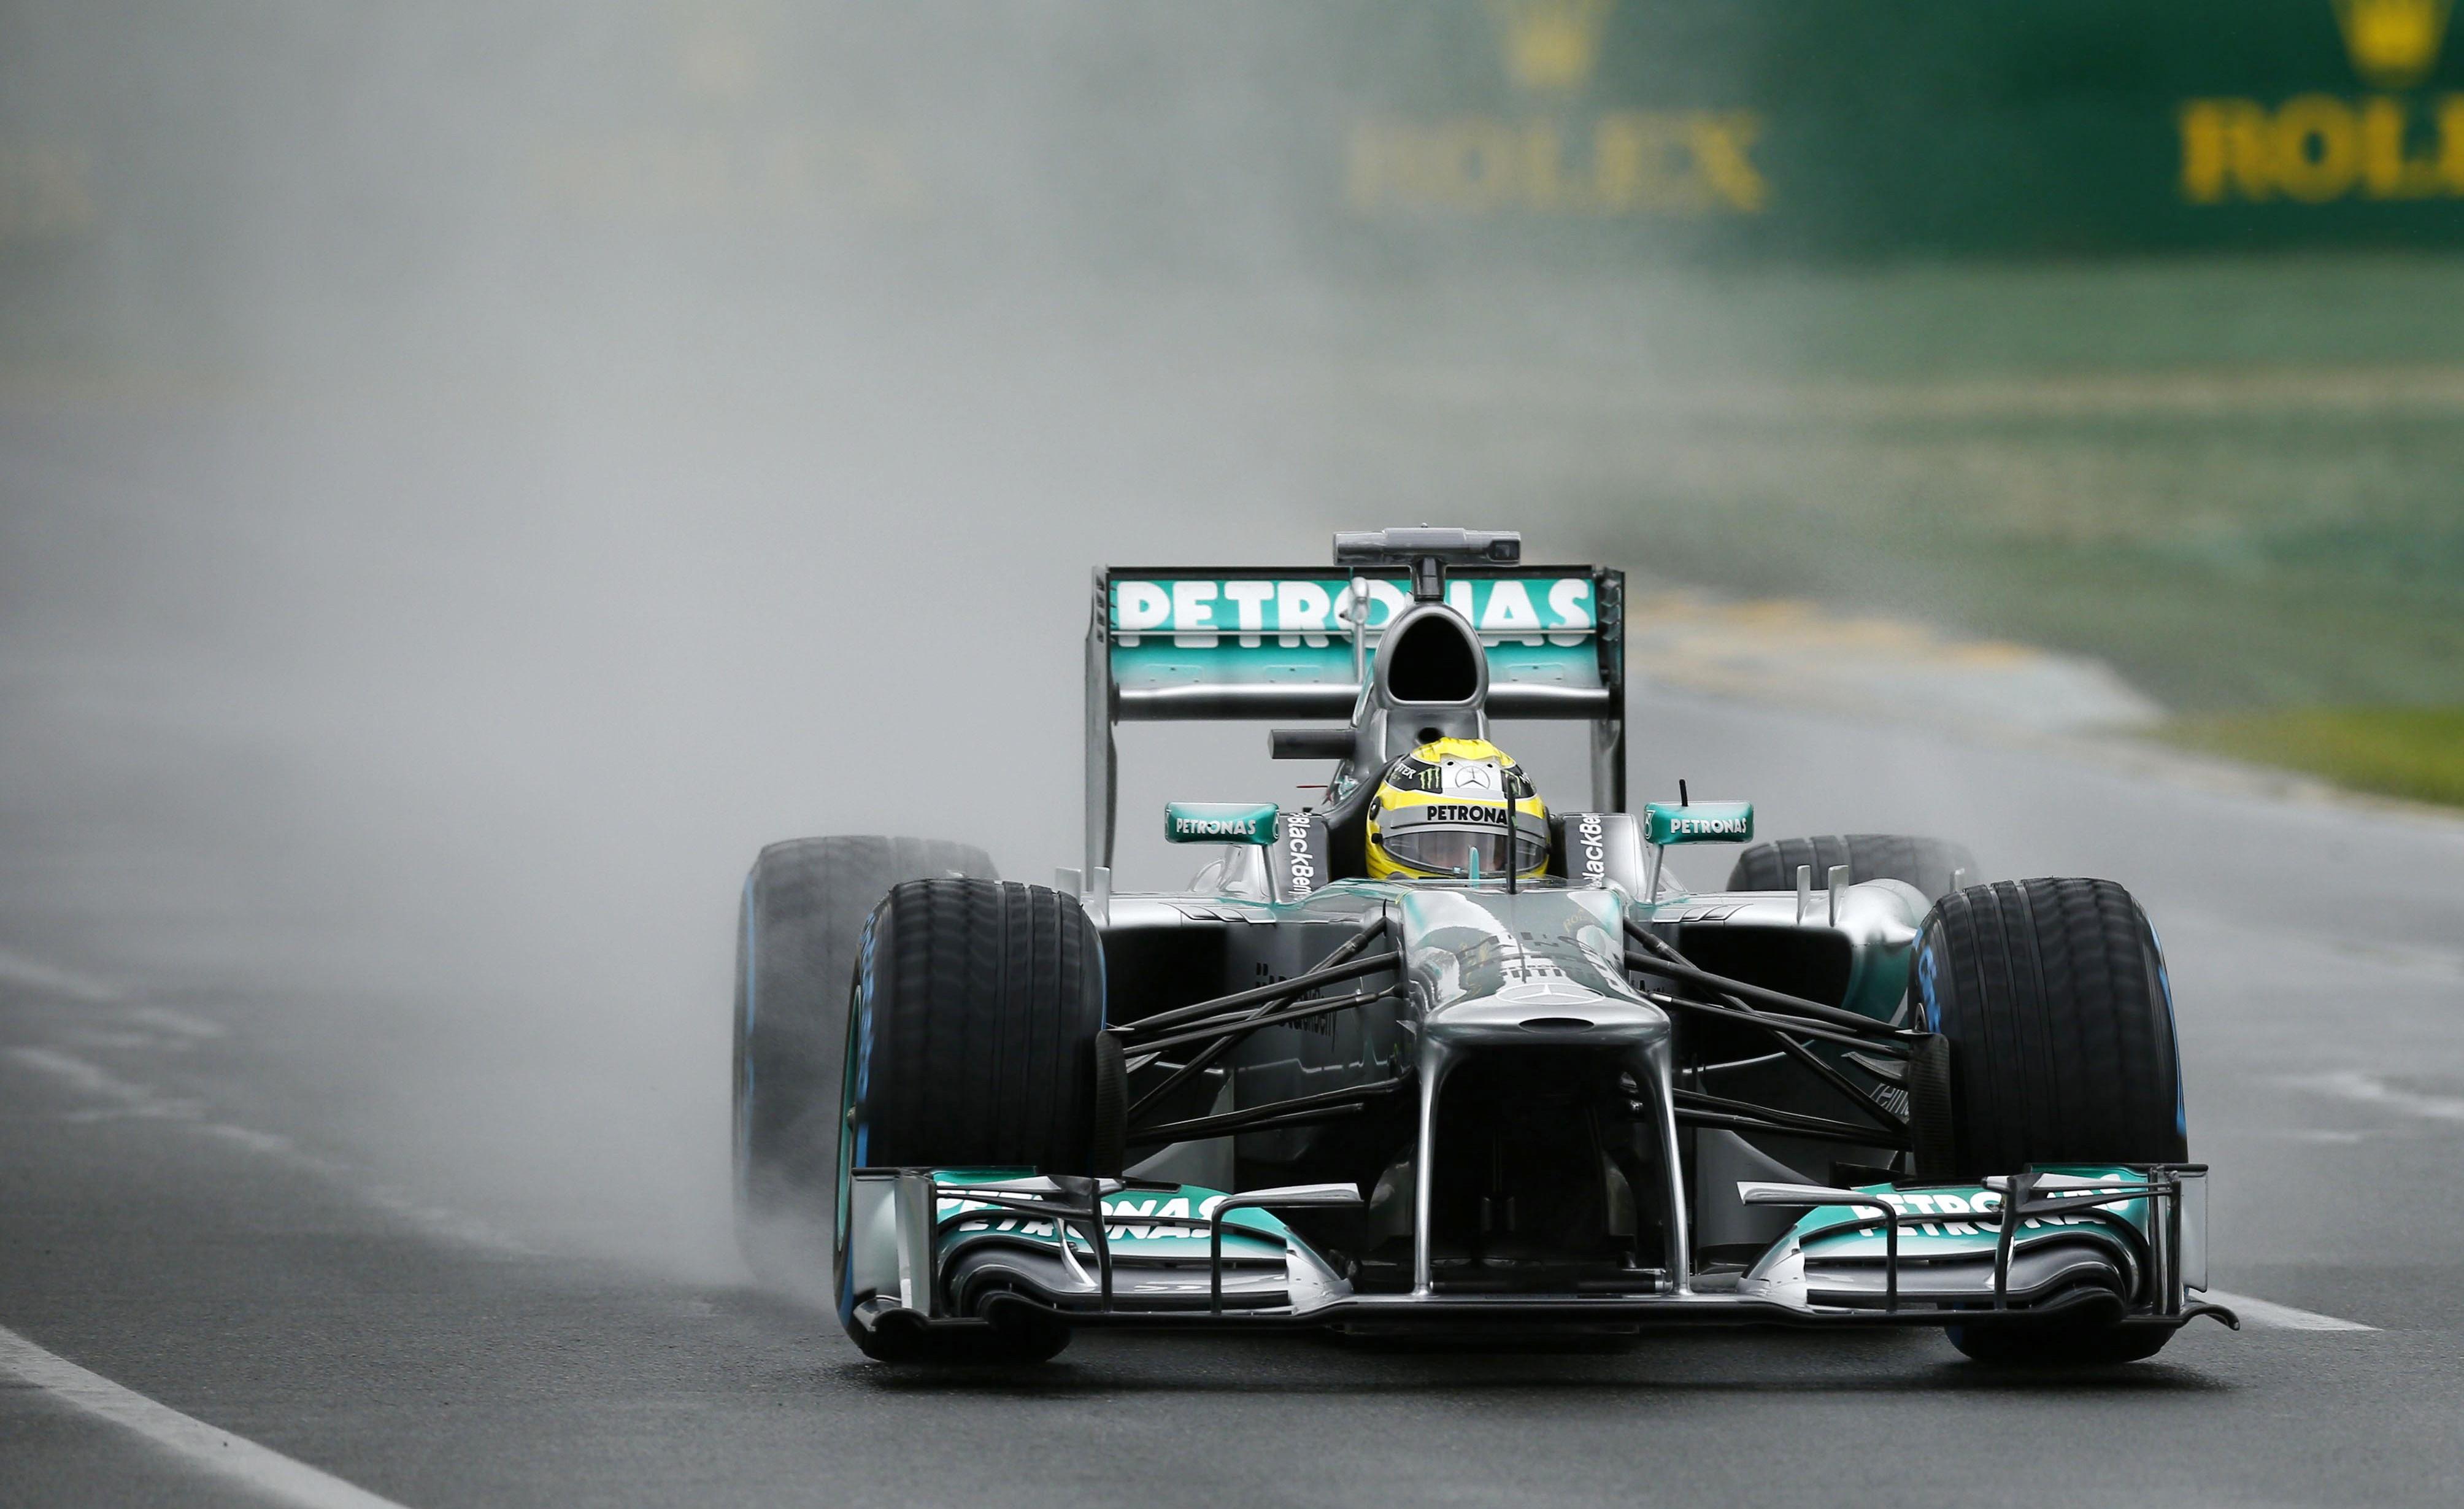 FIA say 'no complaints' as heavy rain halts Australian Grand Prix qualifying